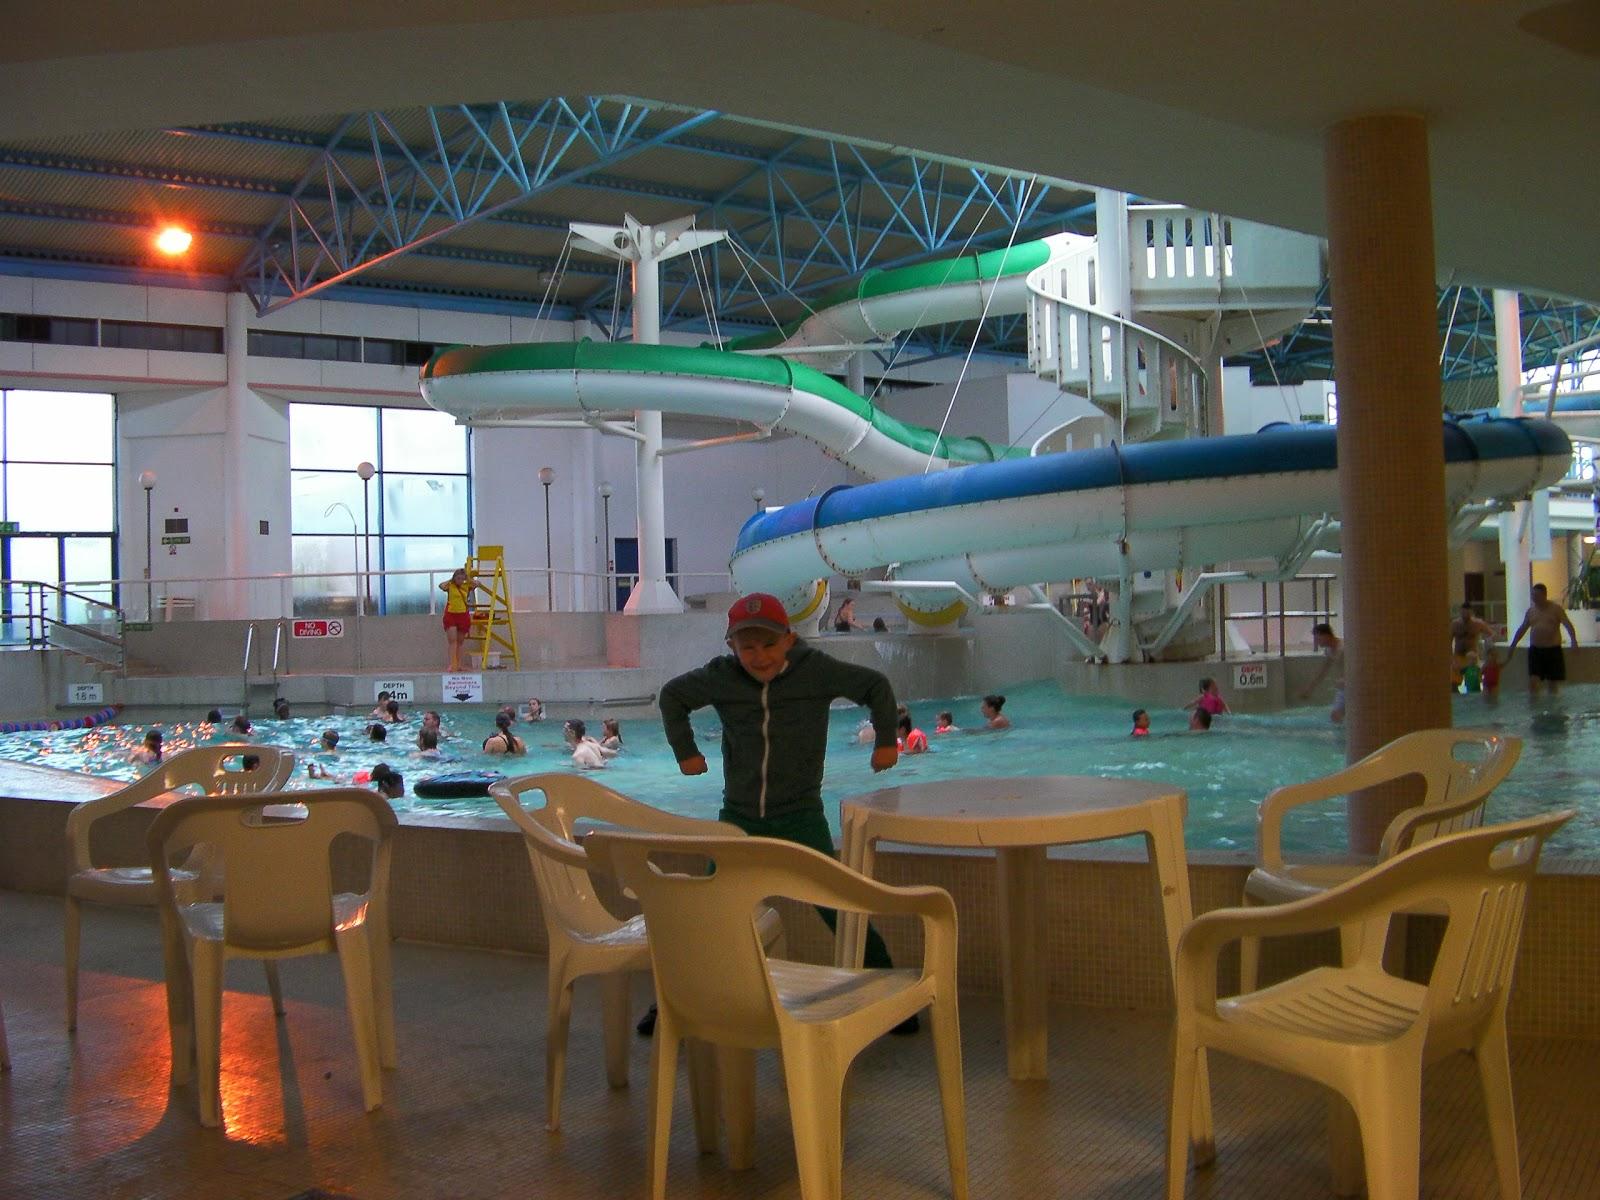 Professor mungleton the pyramid of success for Pyramid swimming pool portsmouth